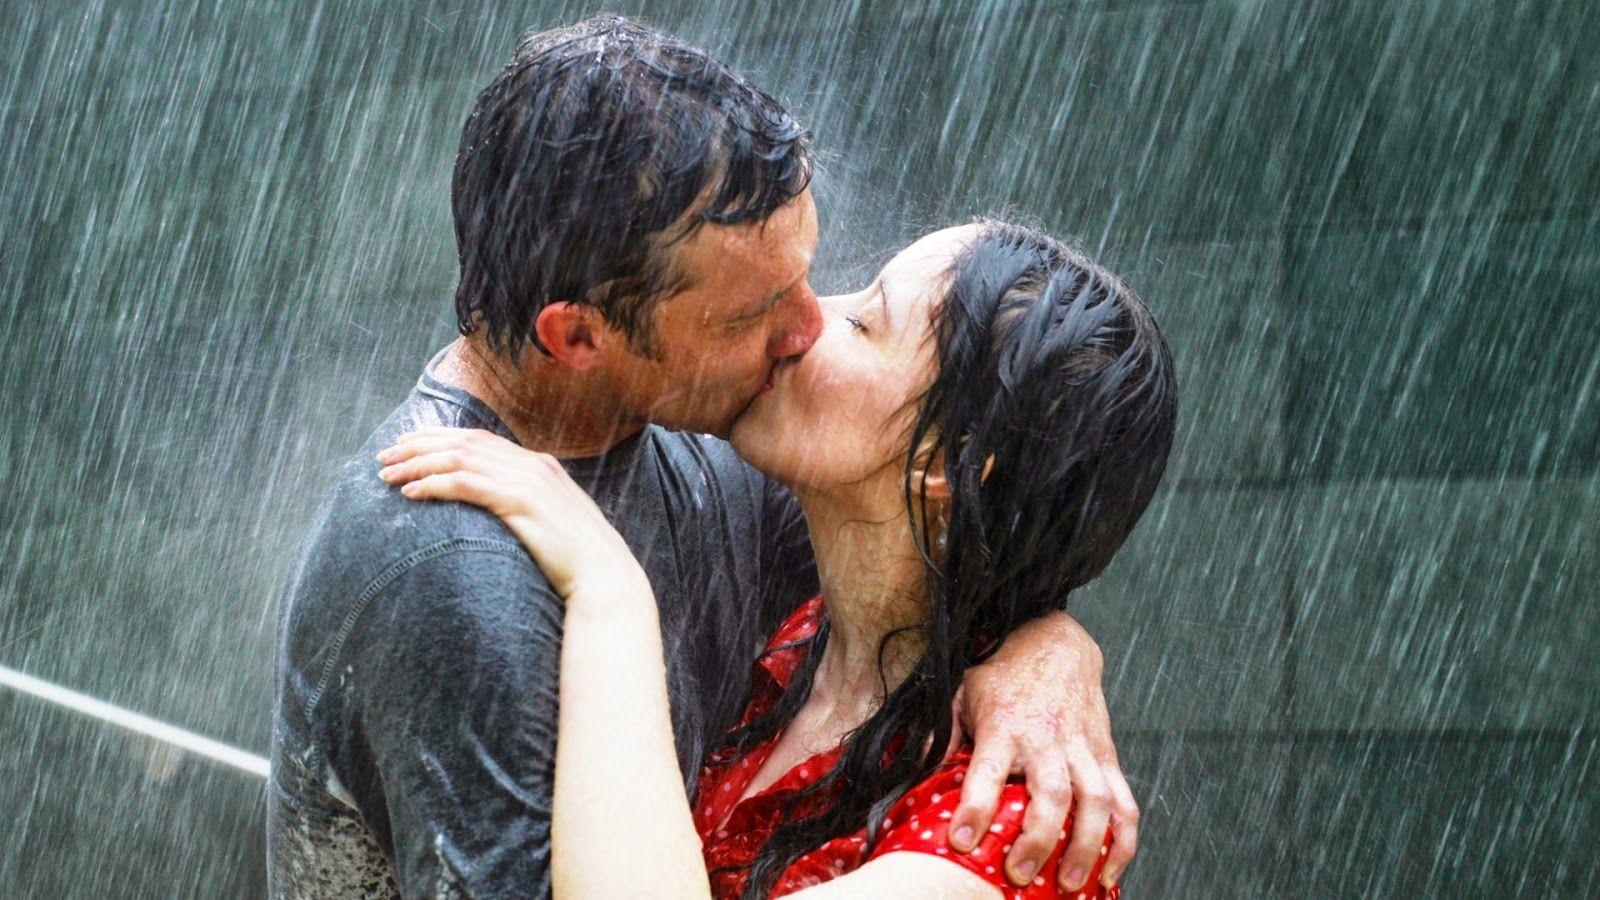 Love Kiss Wallpaper Hd Download Bayoen Le Forum